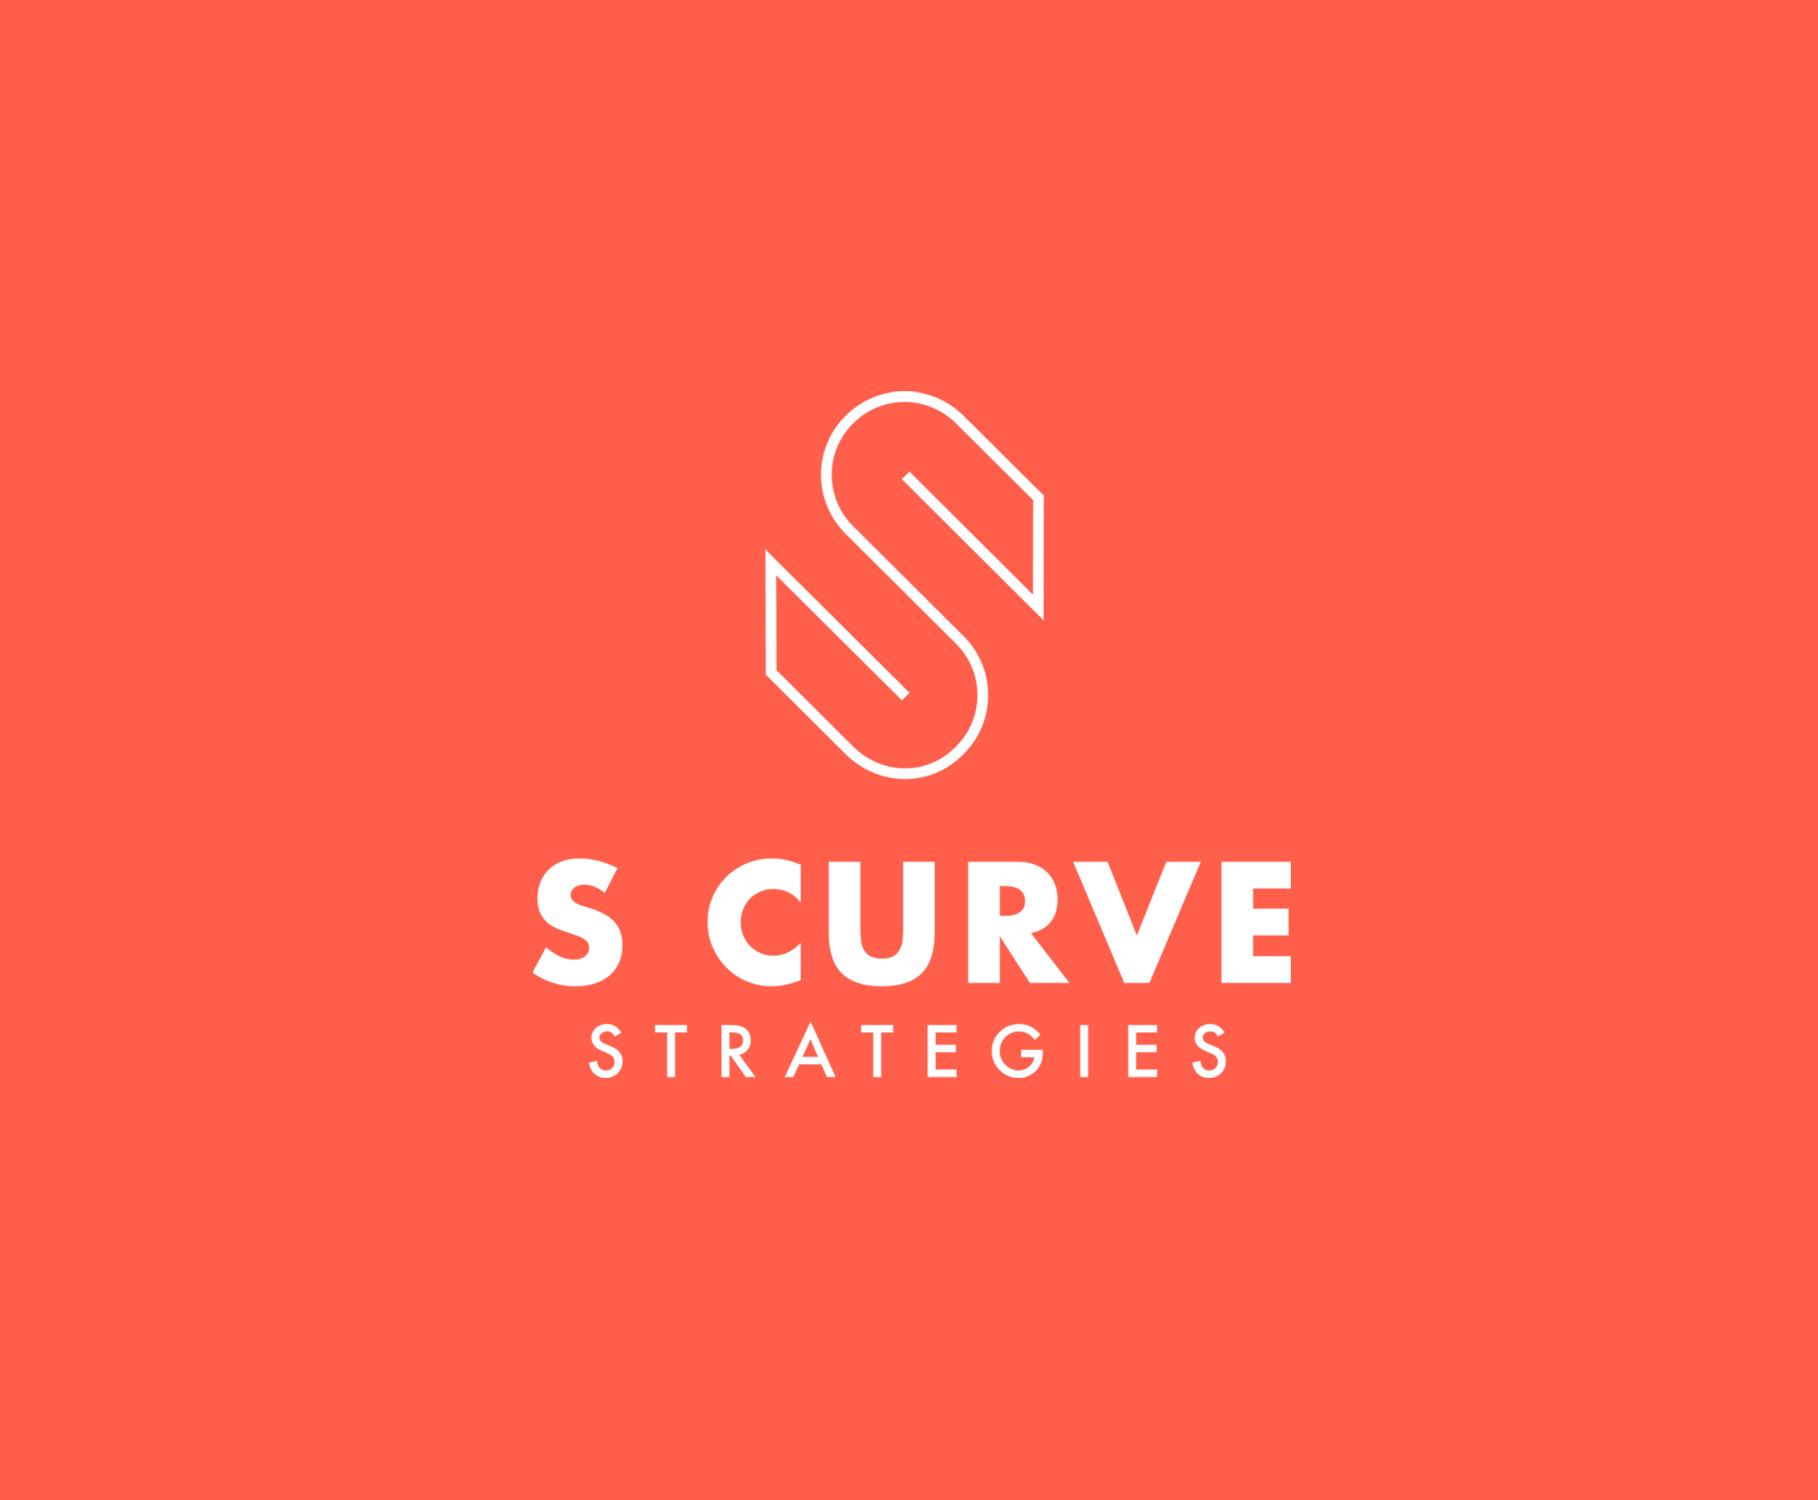 Client: S Curve Strategies